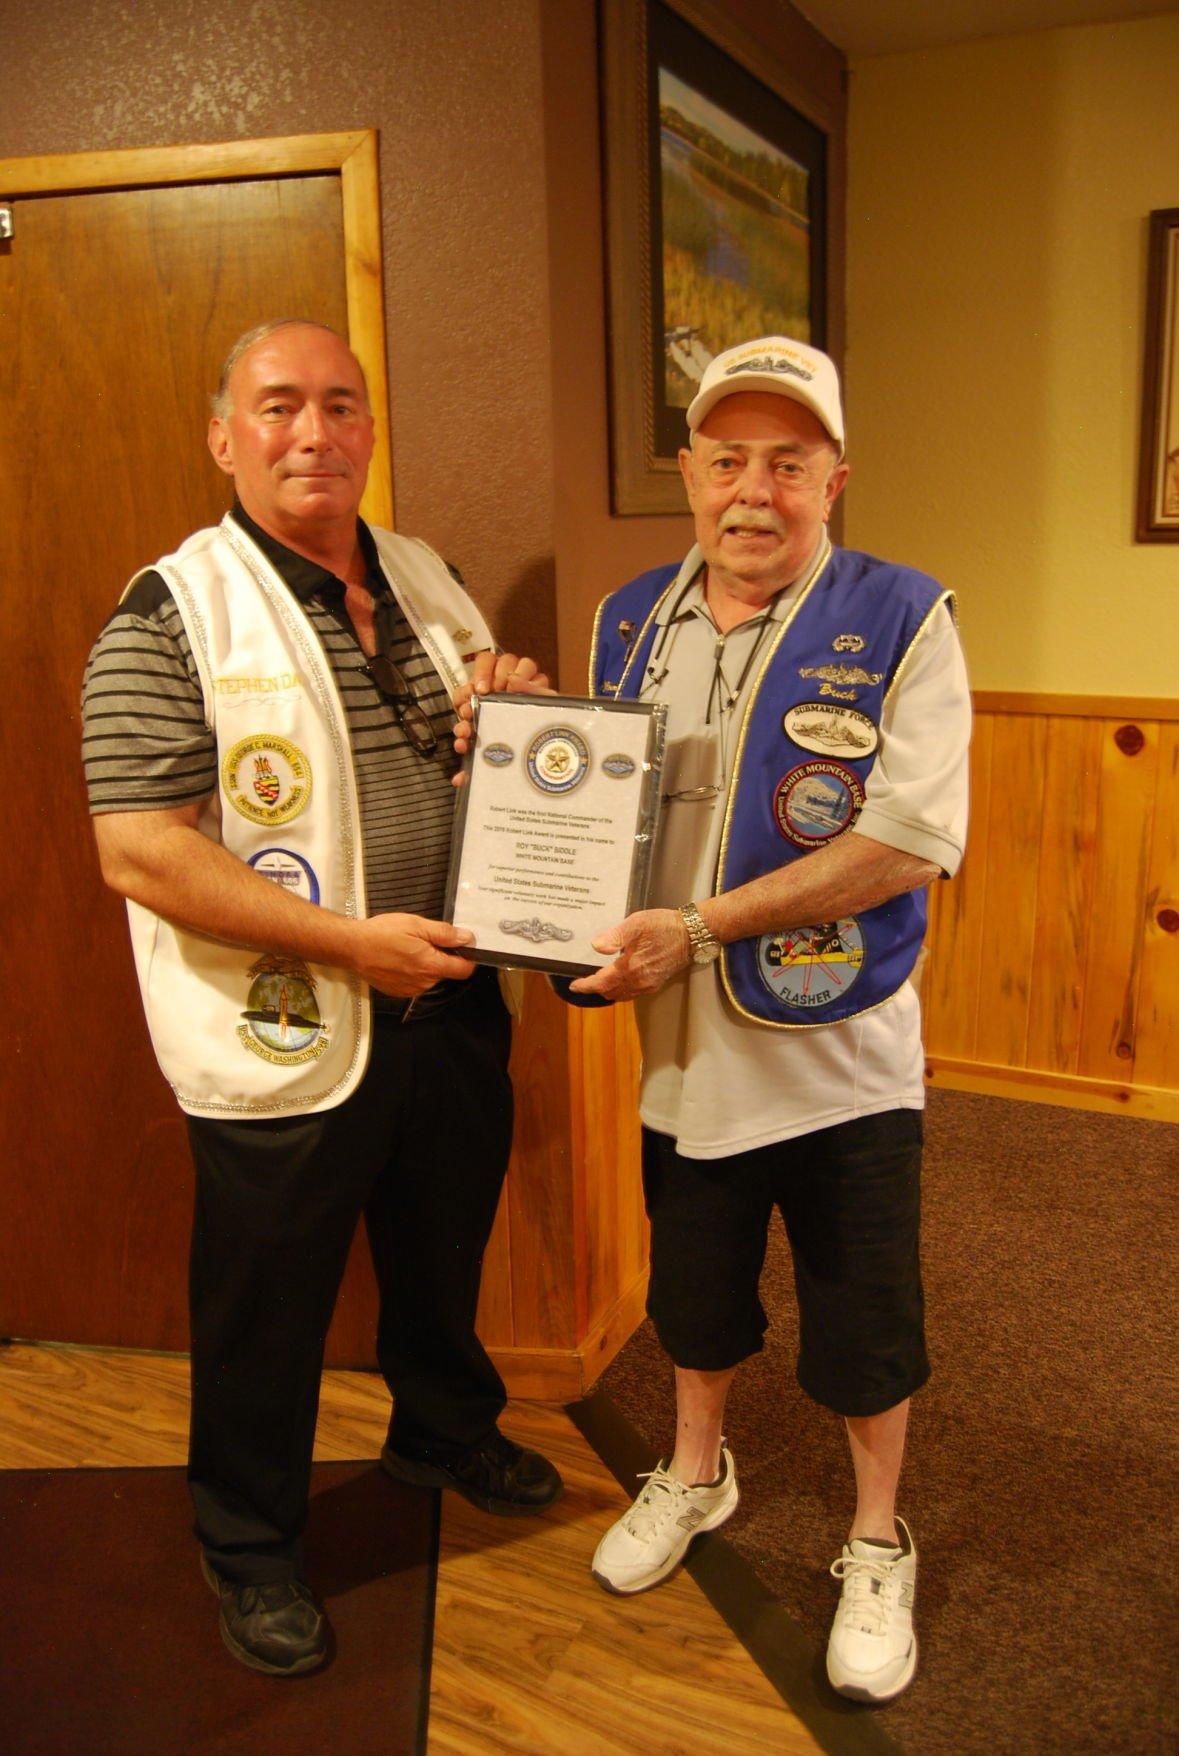 Buck Biddle receives award